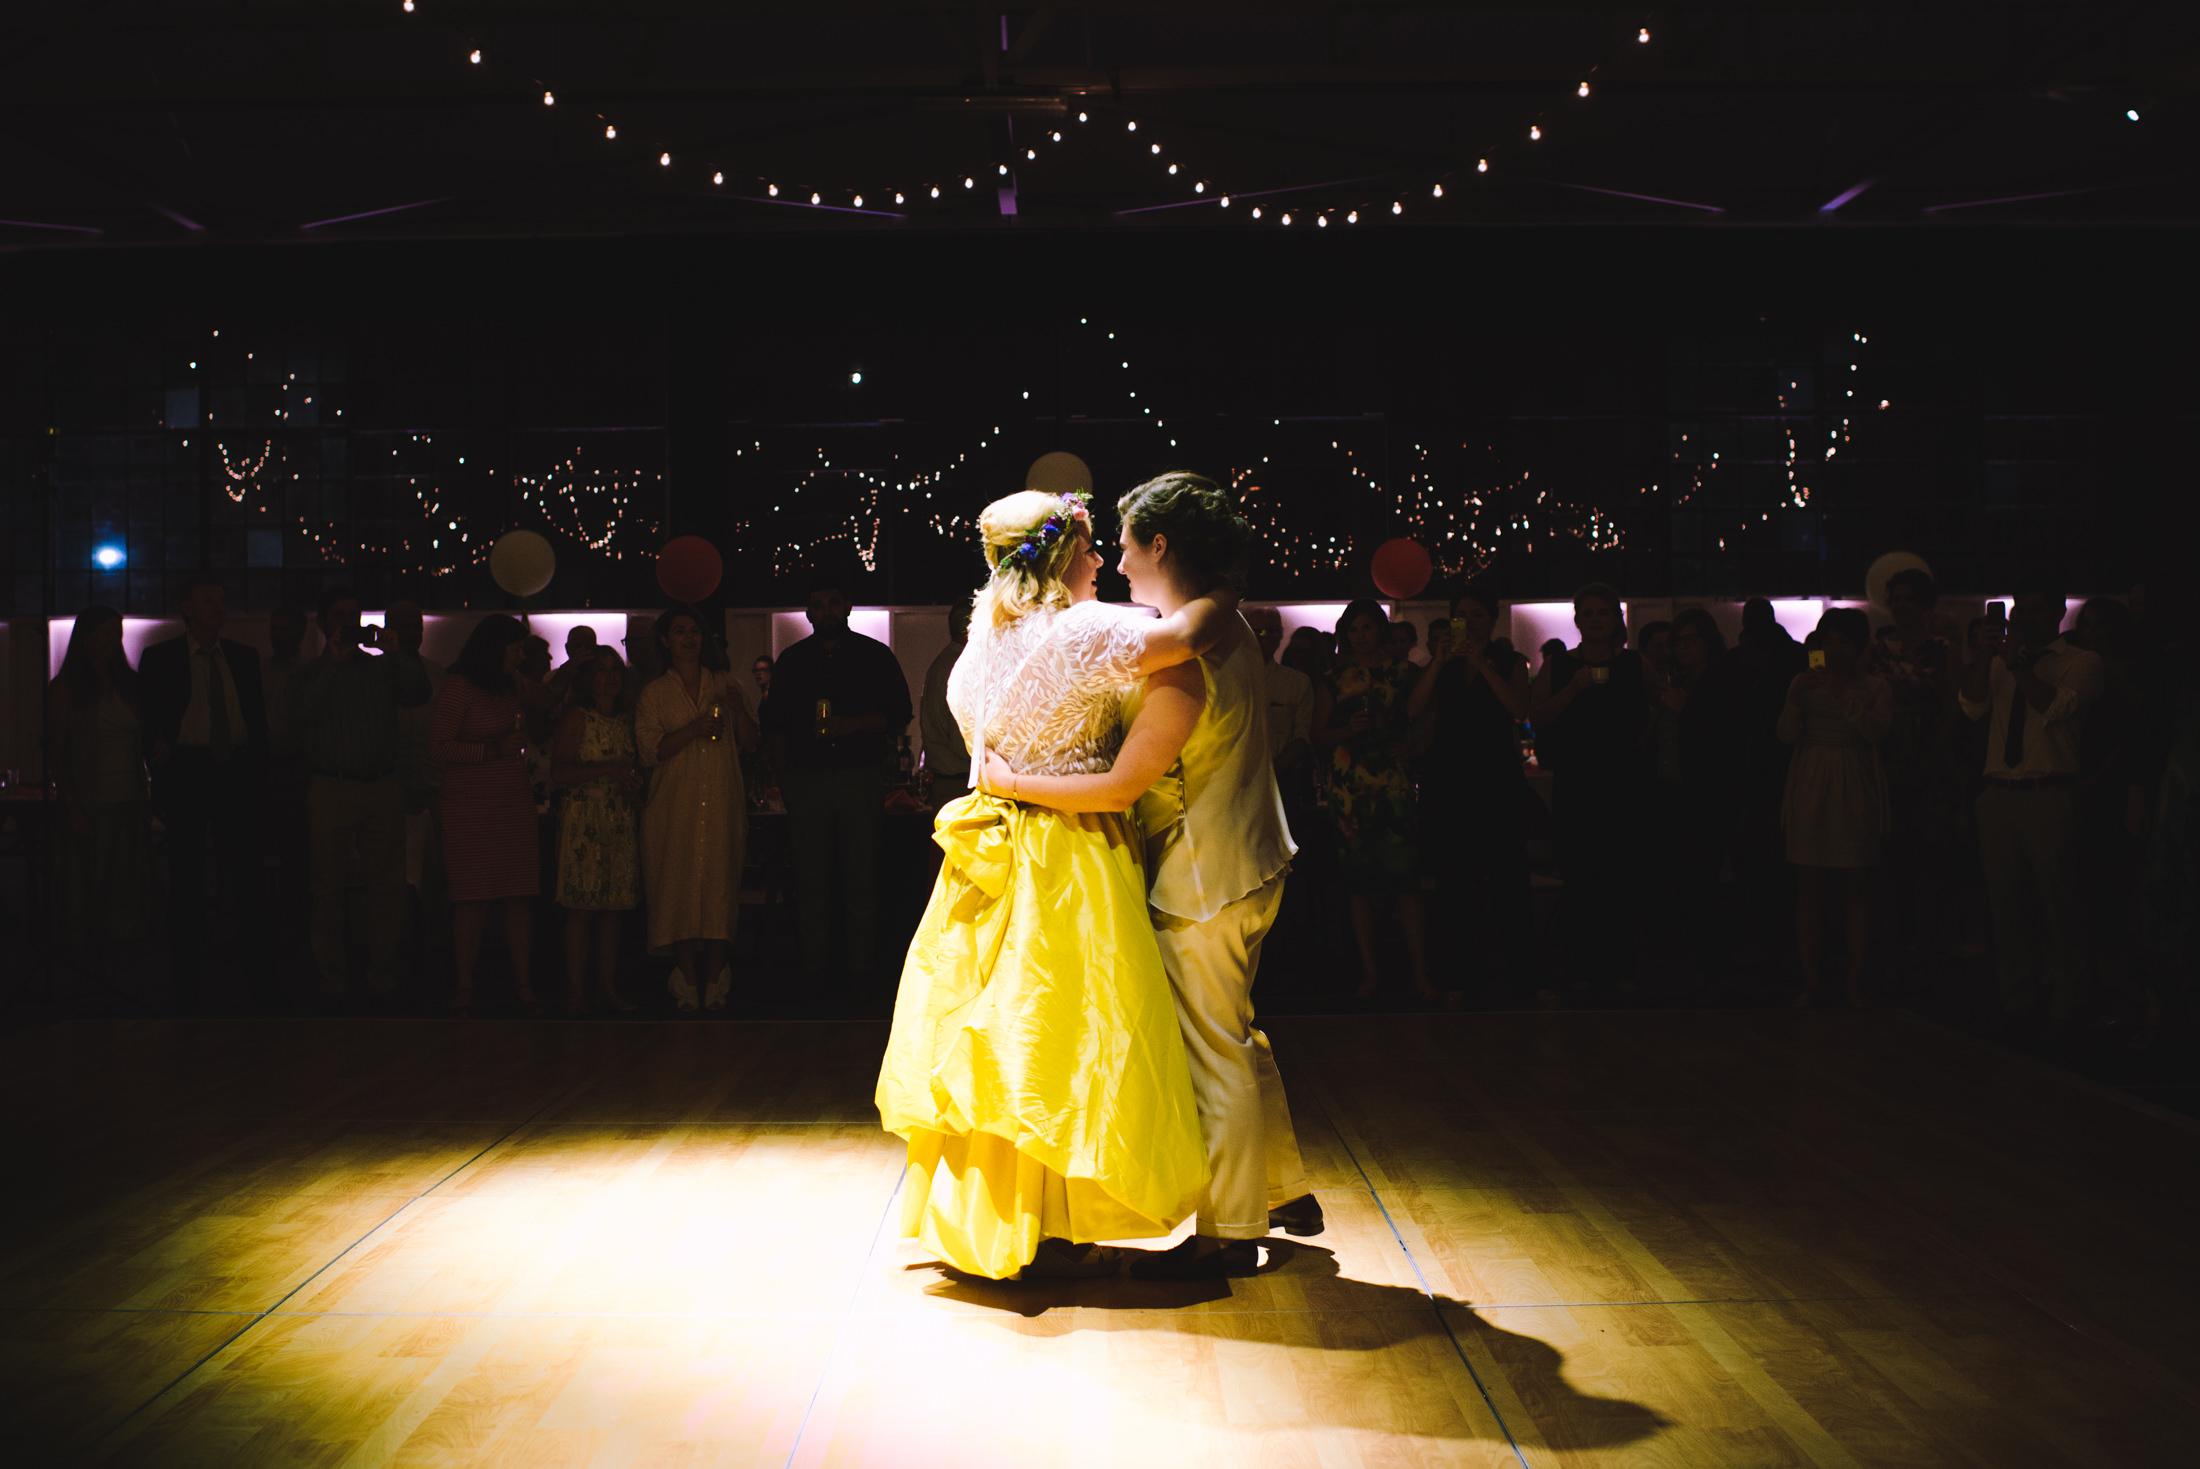 20160730_AmberZbitnoffPhotography_SeattleWedding_Hangar30LK_096_2183_2200blog.jpg